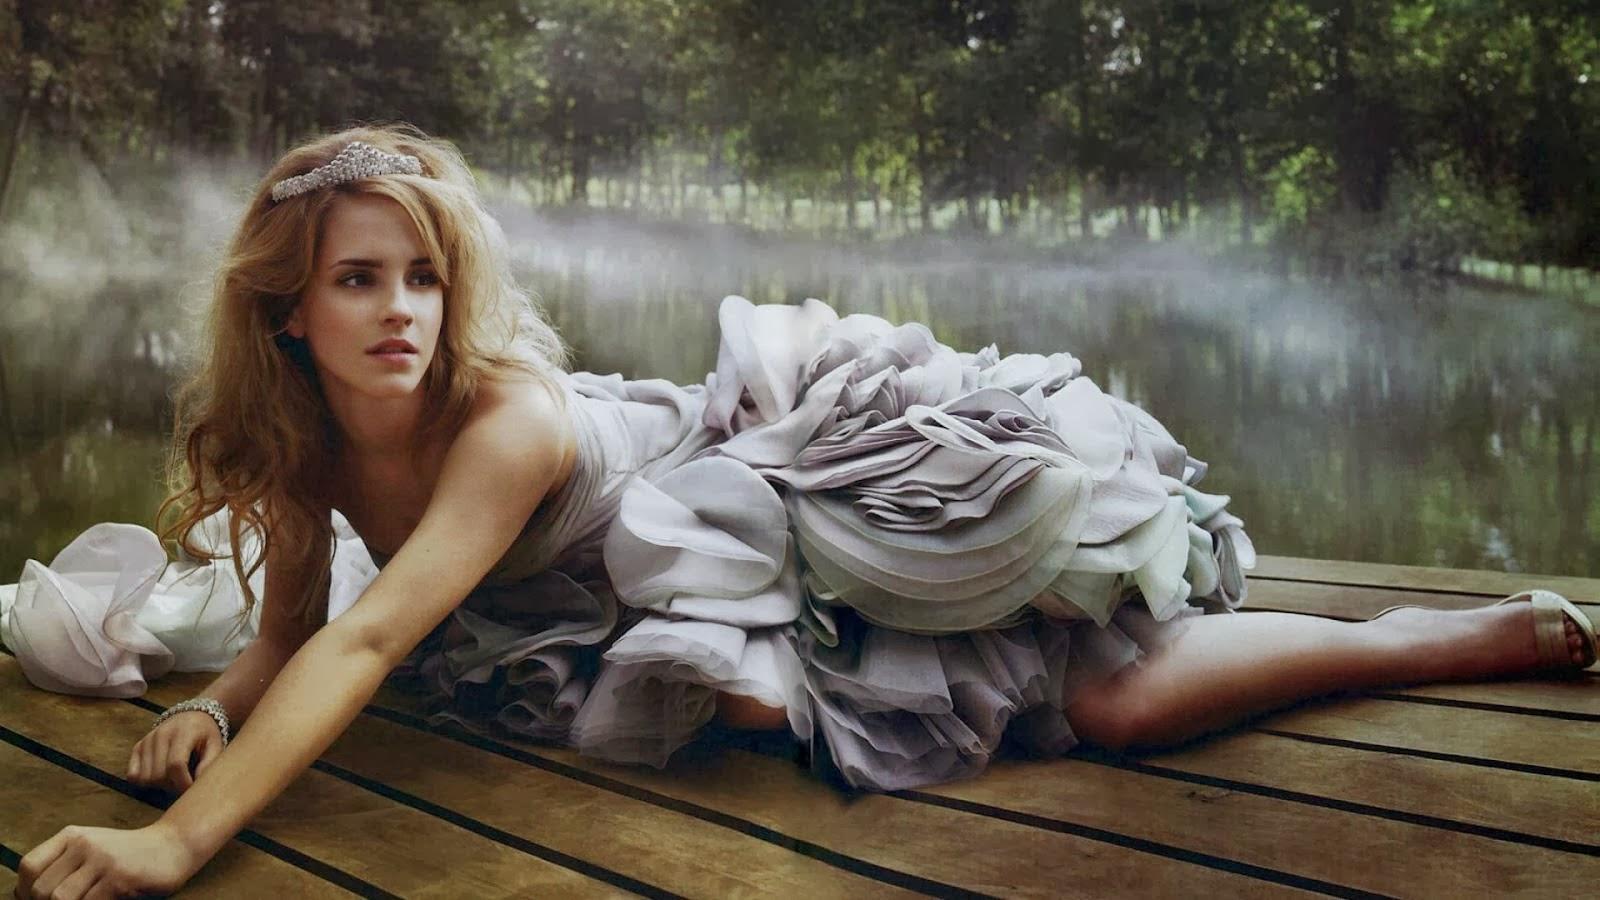 emma watson hd wallpapers 1080p 2014 1600x900